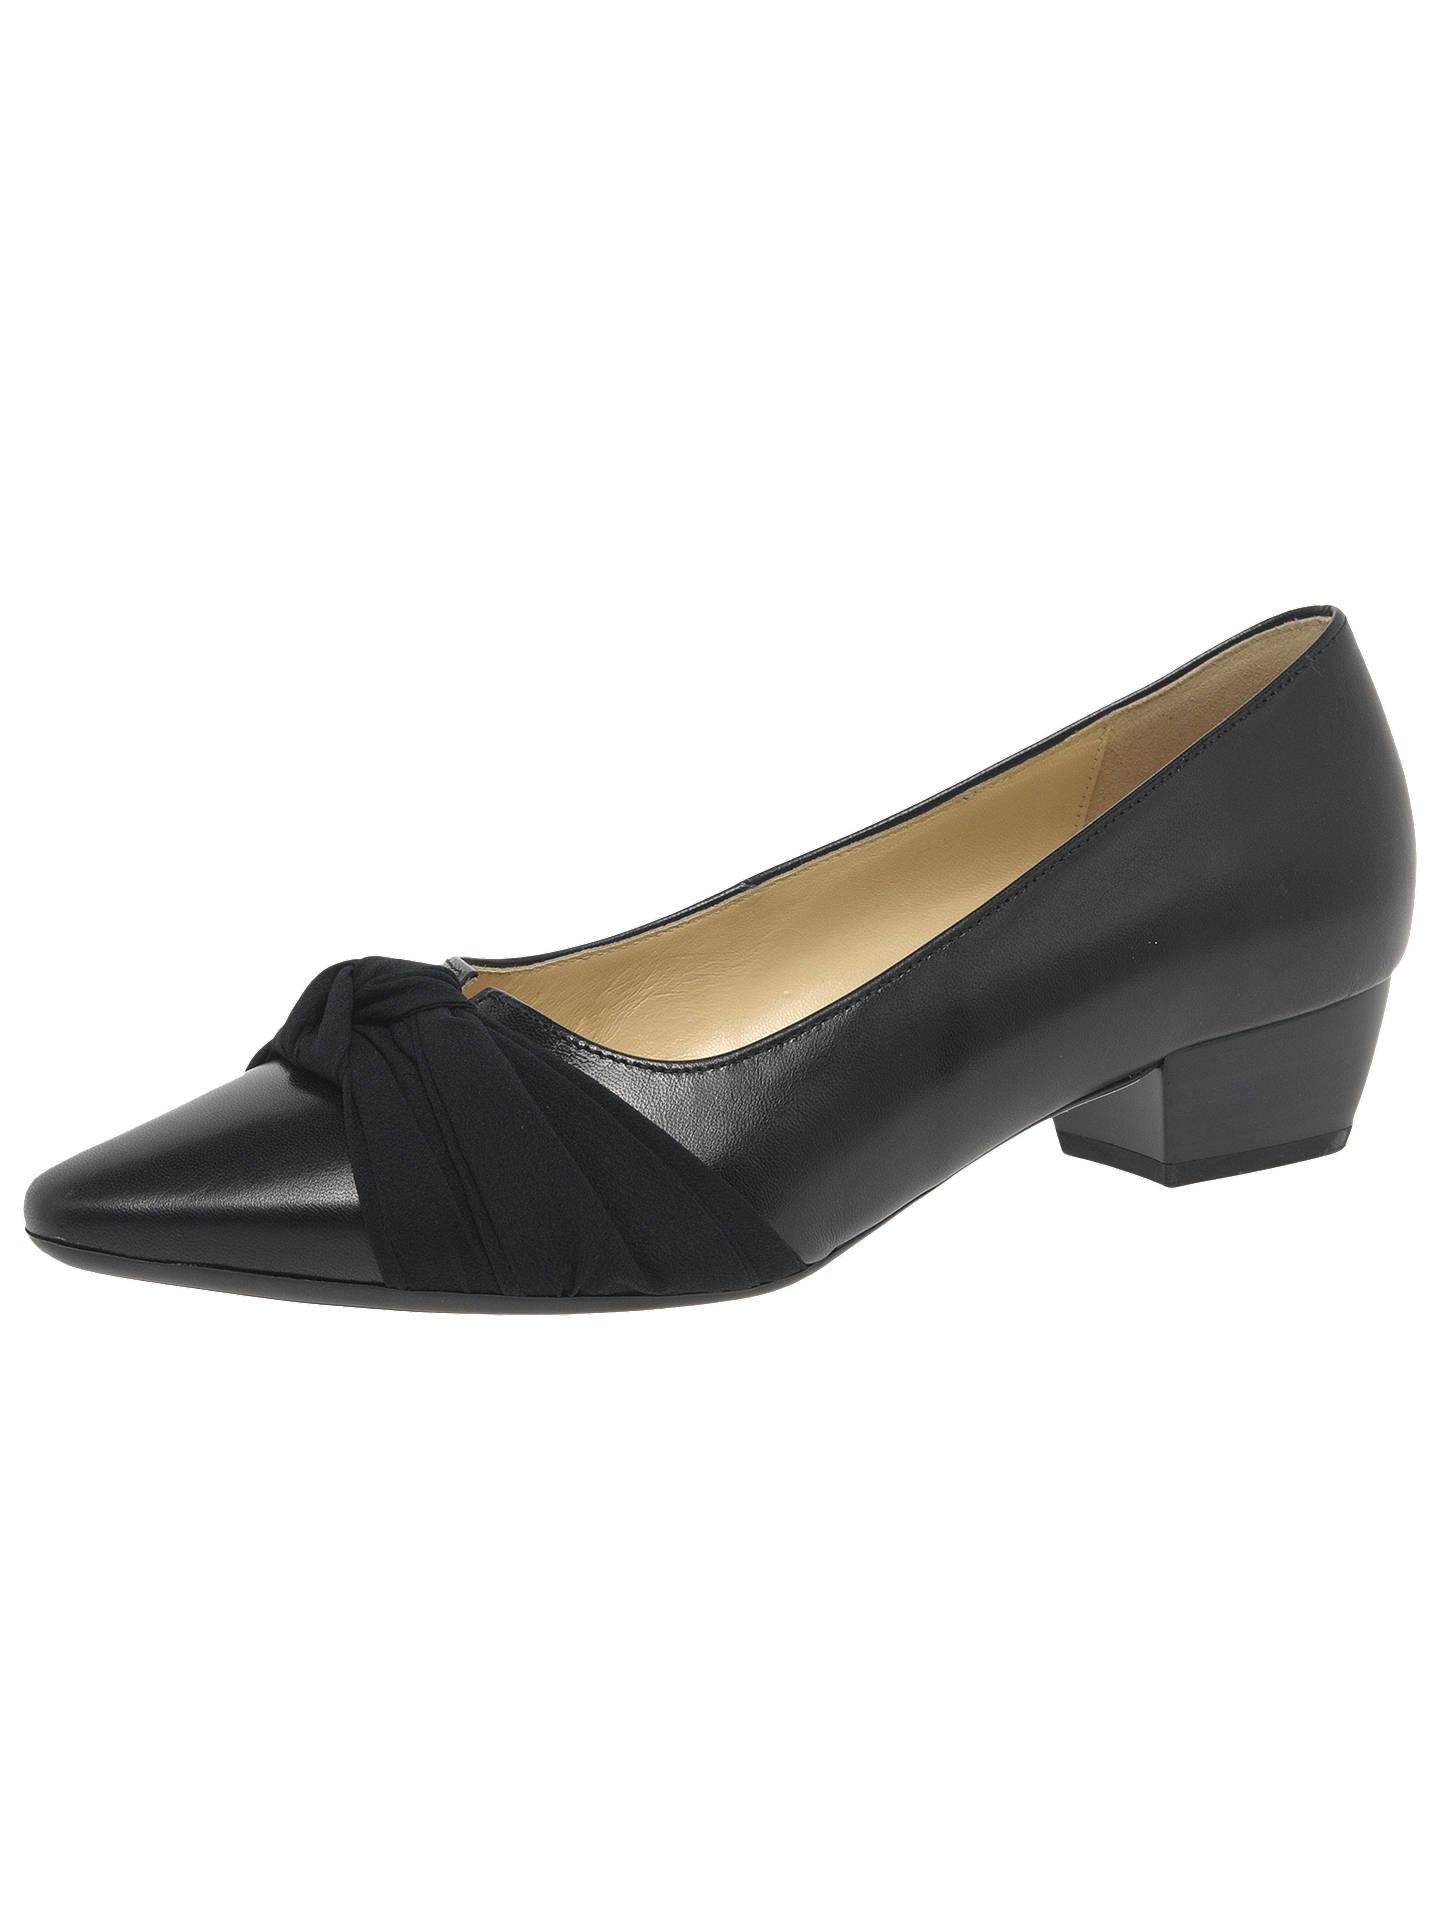 Gabor Fifi Womens Bow Dress Court Shoes